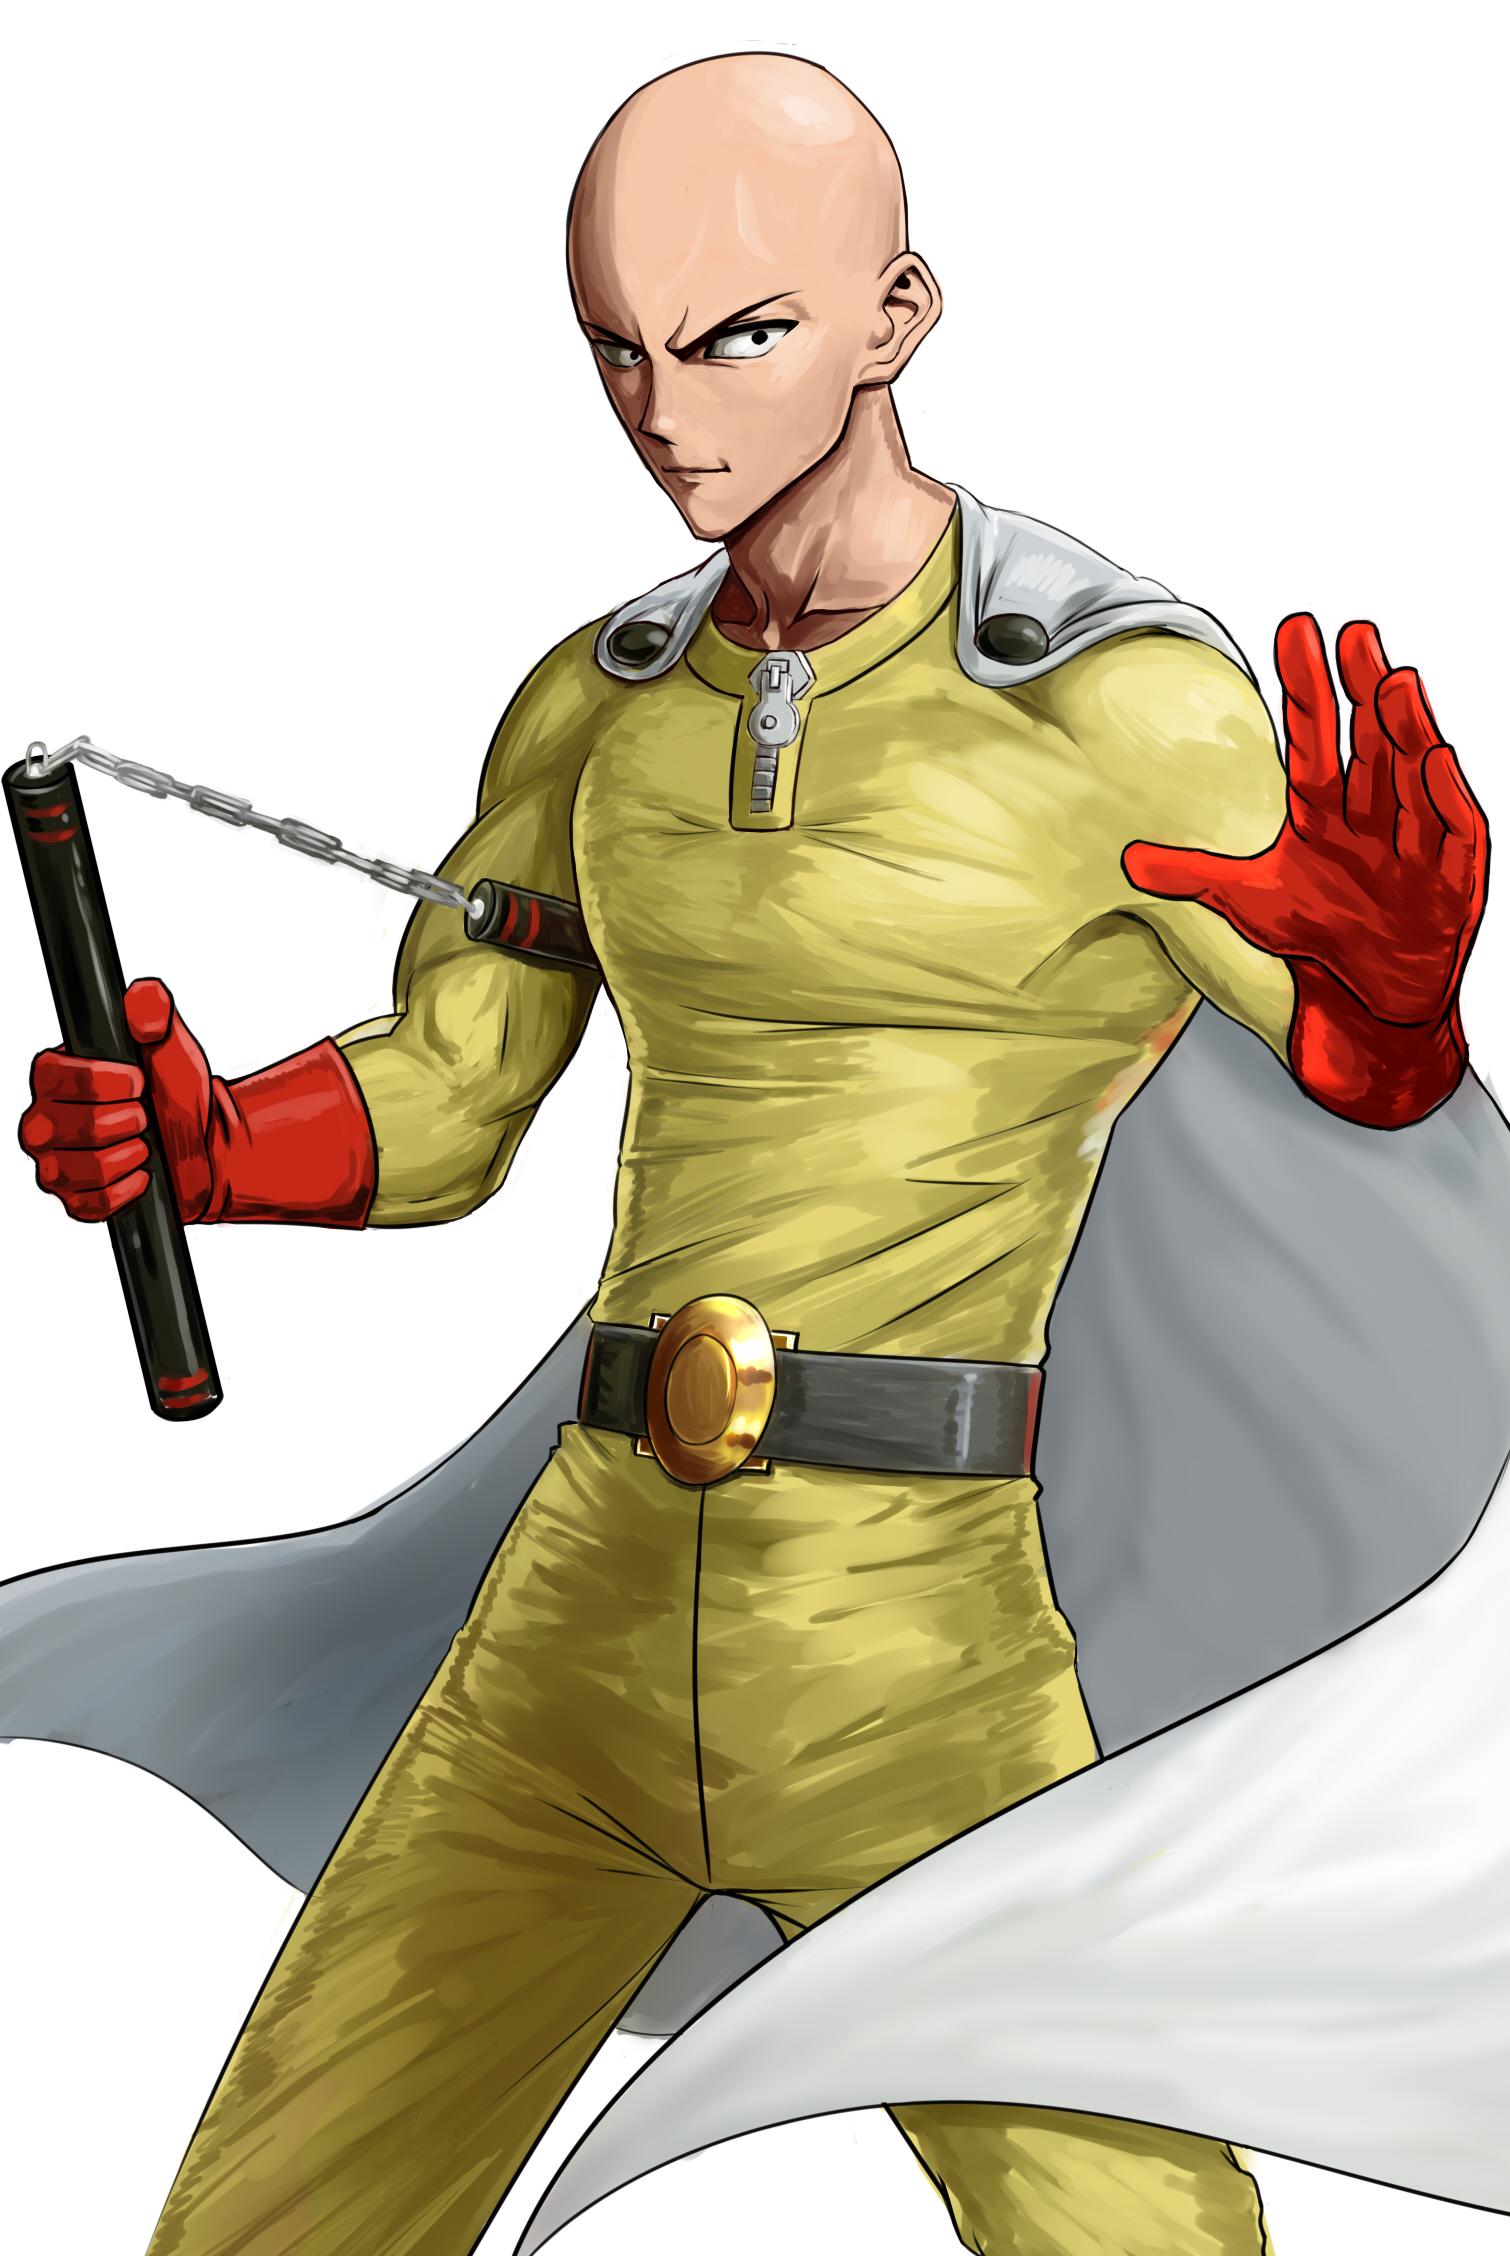 One Punch Man Saitama Lucu - Saitama (One Punch Man) | page 5 of 6 - Zerochan Anime ...